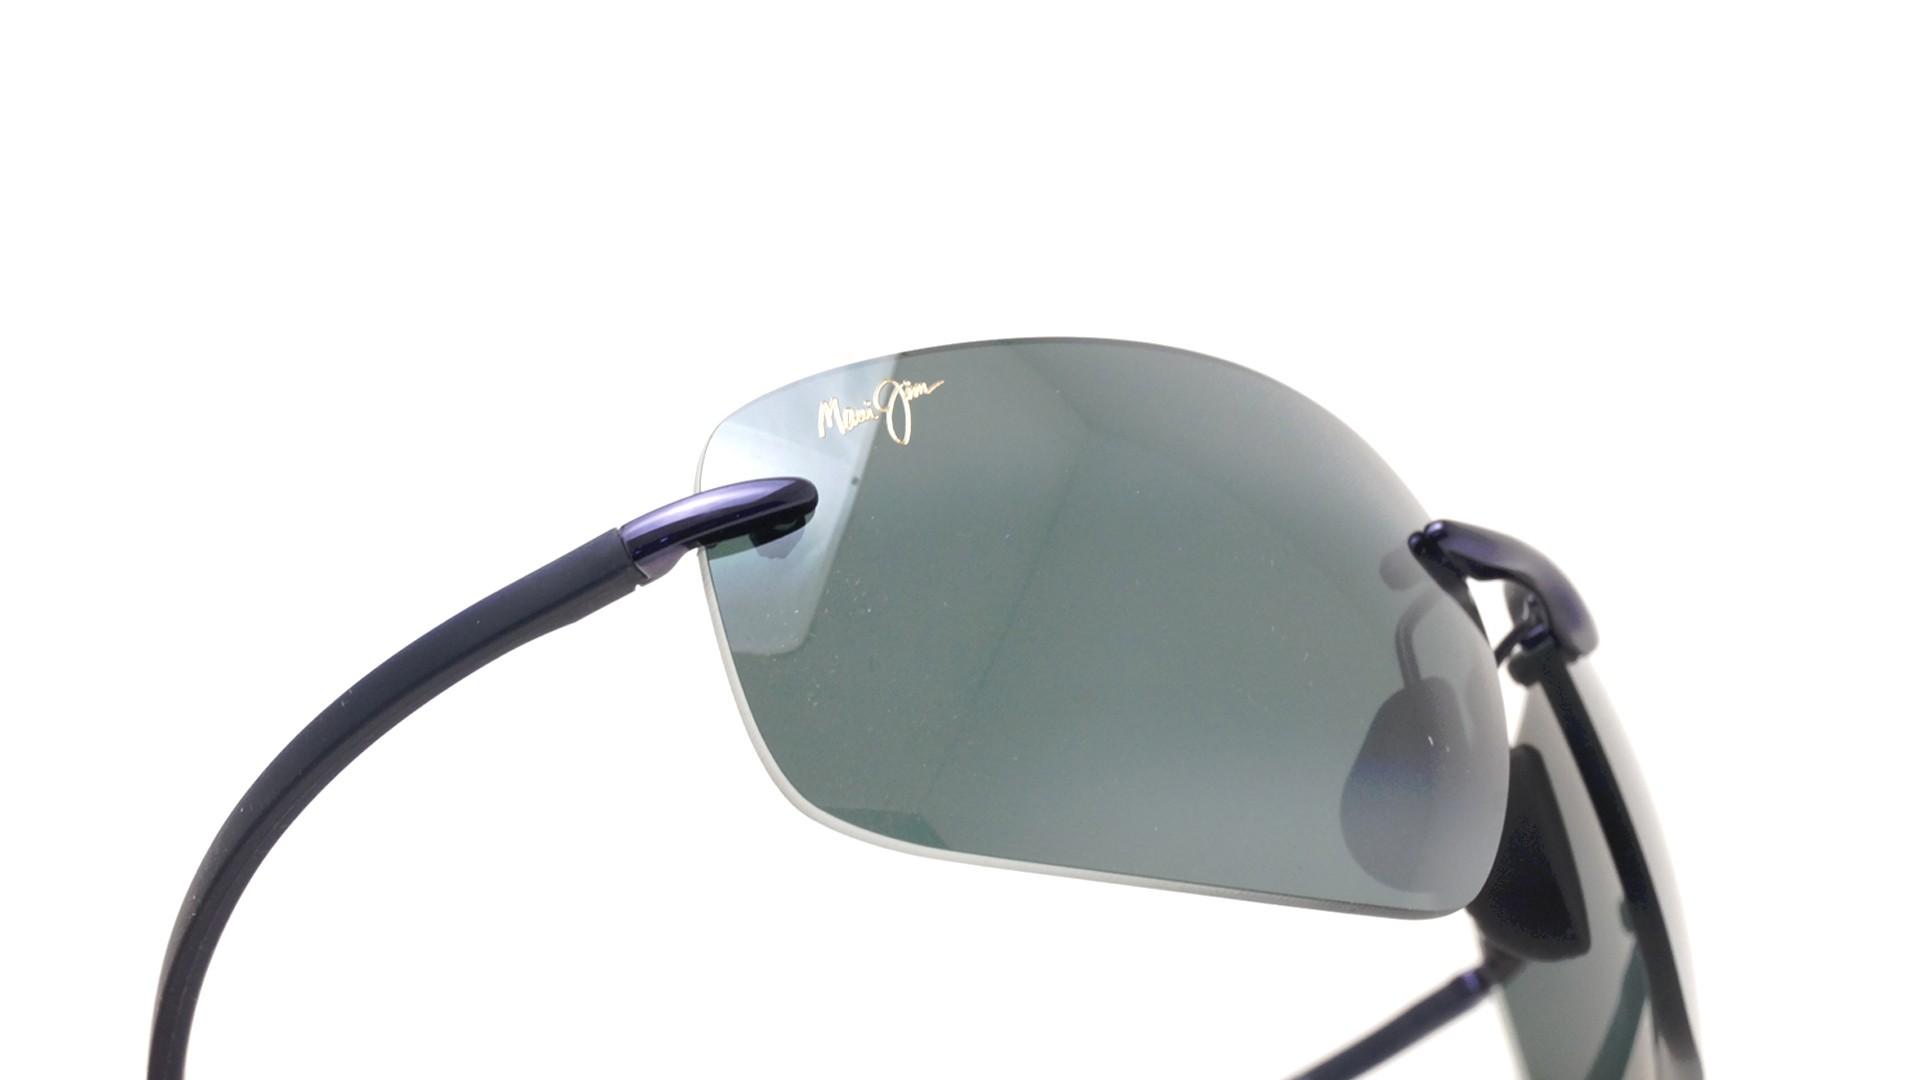 fd323db976c3 Sunglasses Maui Jim Kupuna Blue Neutral Grey 742 06 62-17 Large Polarized  Gradient Mirror